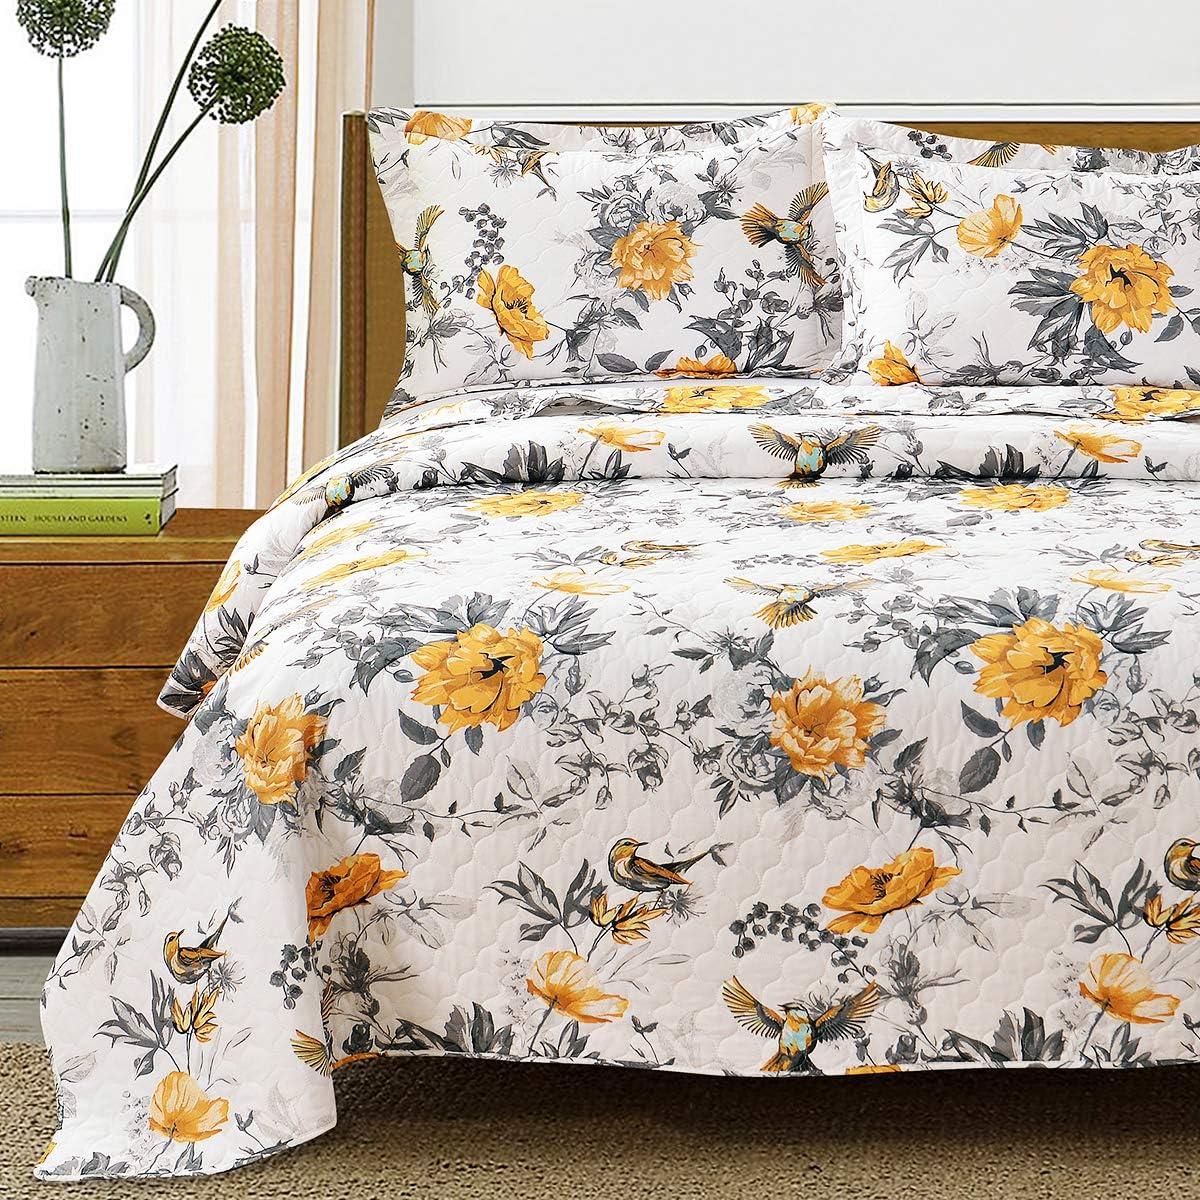 ARL Home King Size Quilts Set 3 Pcs Patchwork Reversible Bedding Set Vintage Floral Bird Lightweight Bedspread Coverlet Set for All Season (1 Quilt, 2 Pillow Shams)